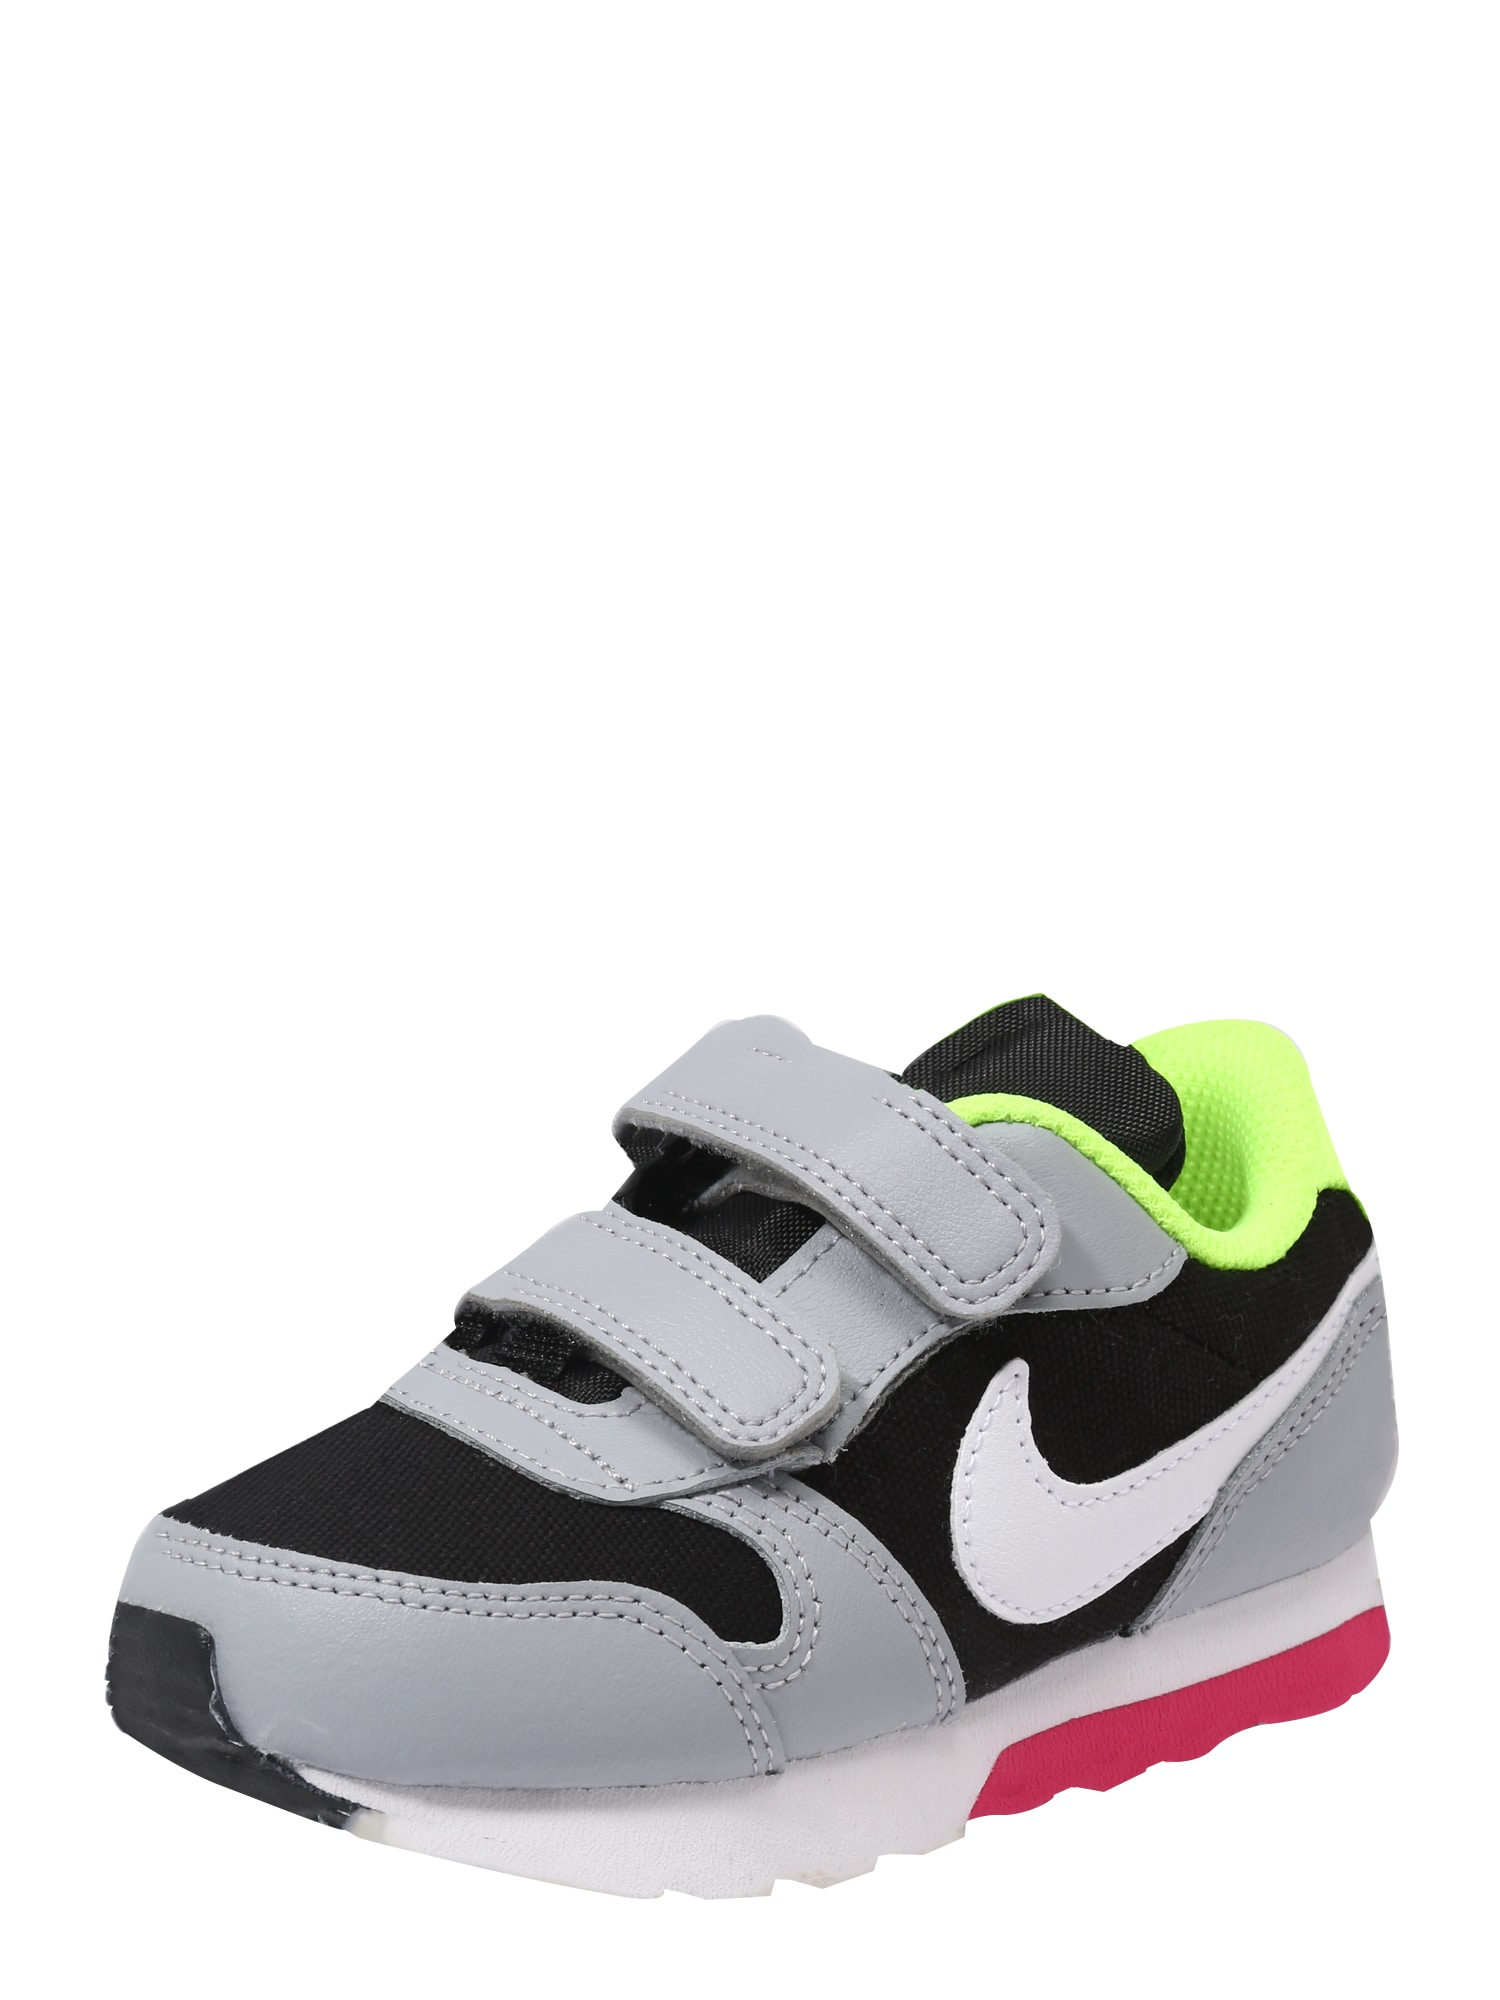 Tenisky Runner 2 šedá pink černá bílá Nike Sportswear